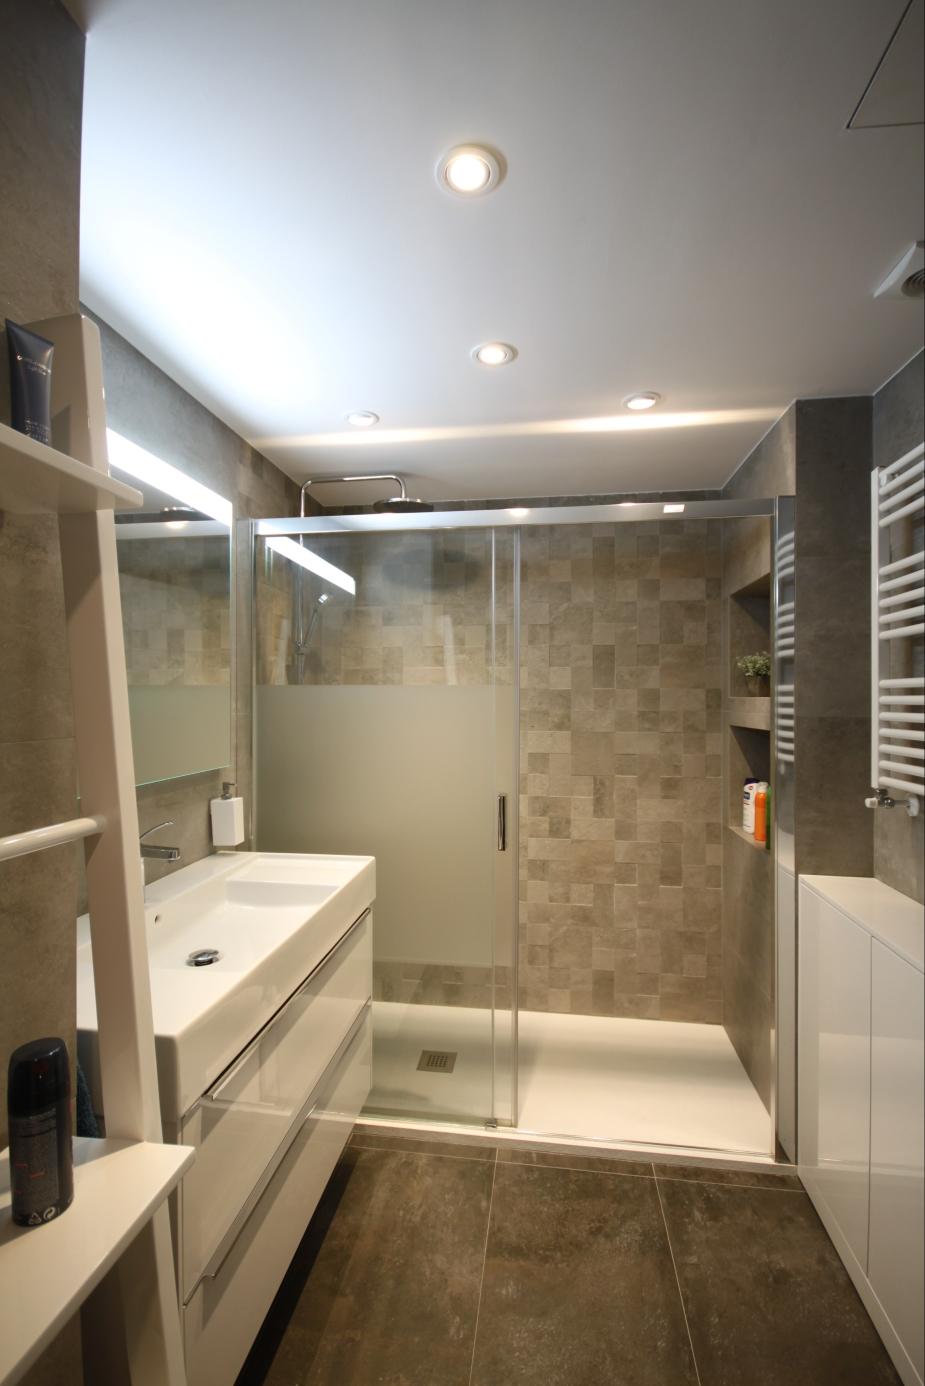 Gahecor baño reformado con azulejo de saloni